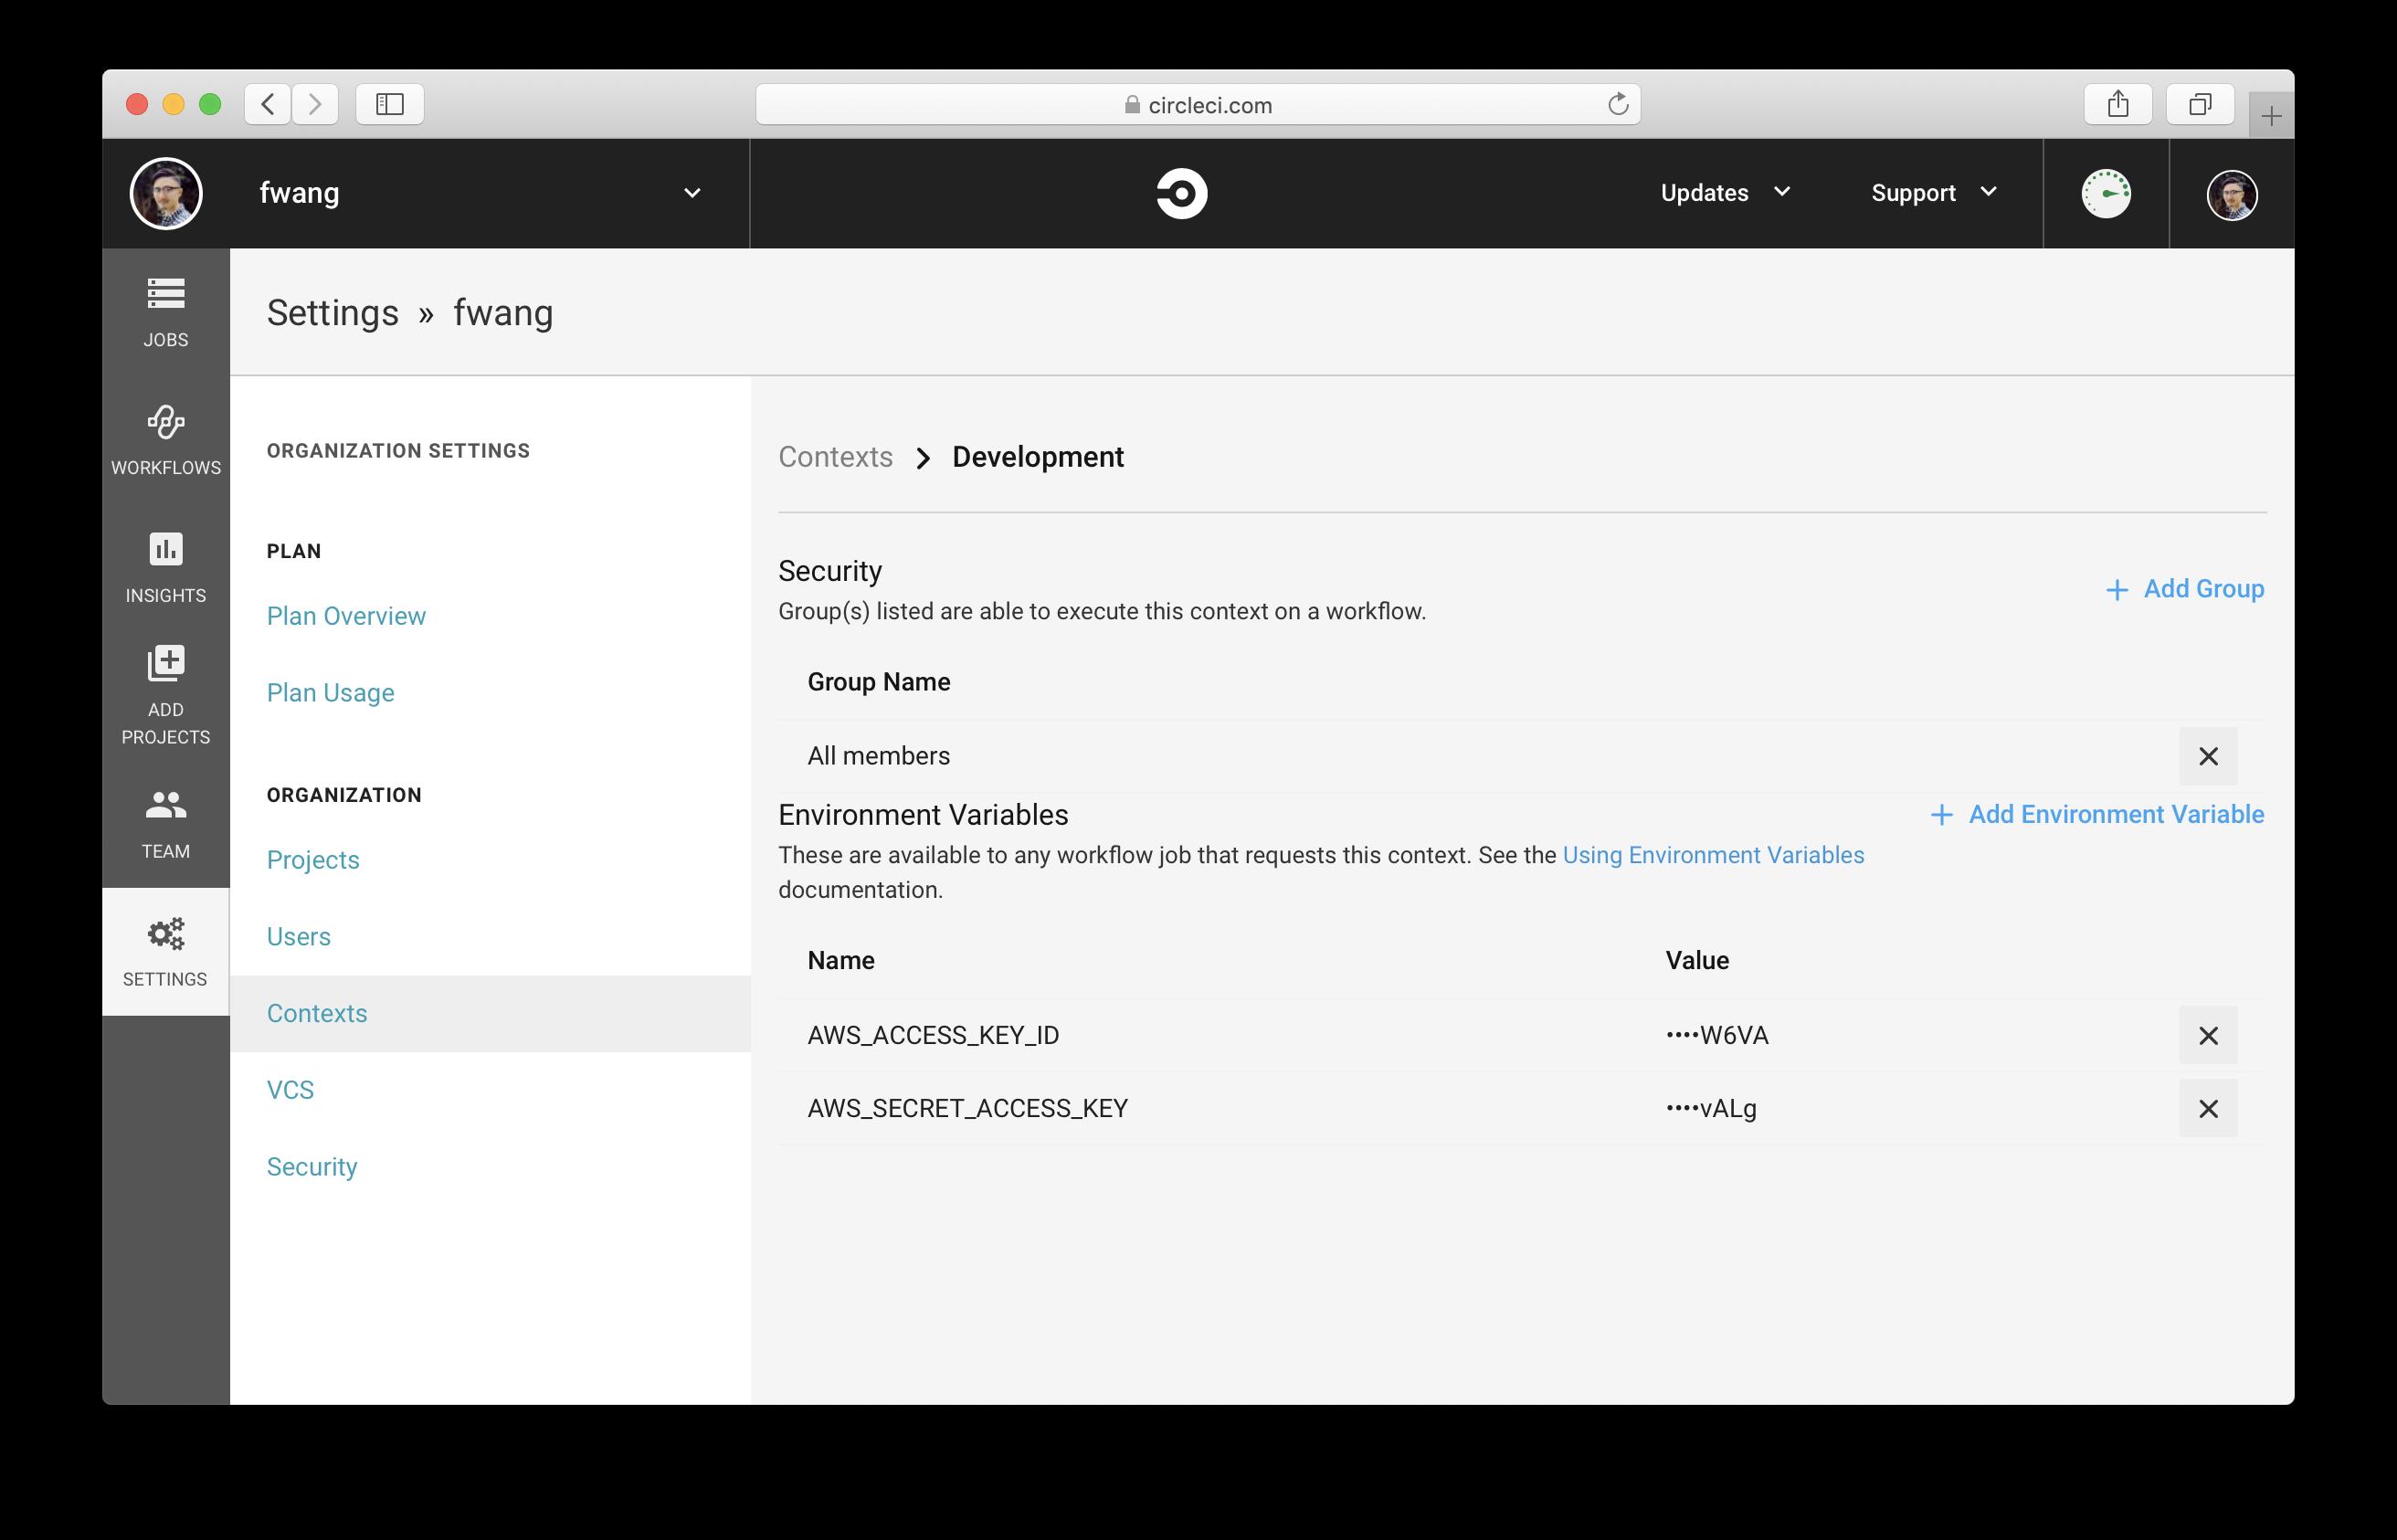 Add AWS Secret Access Key as Environment Variable in CircleCI